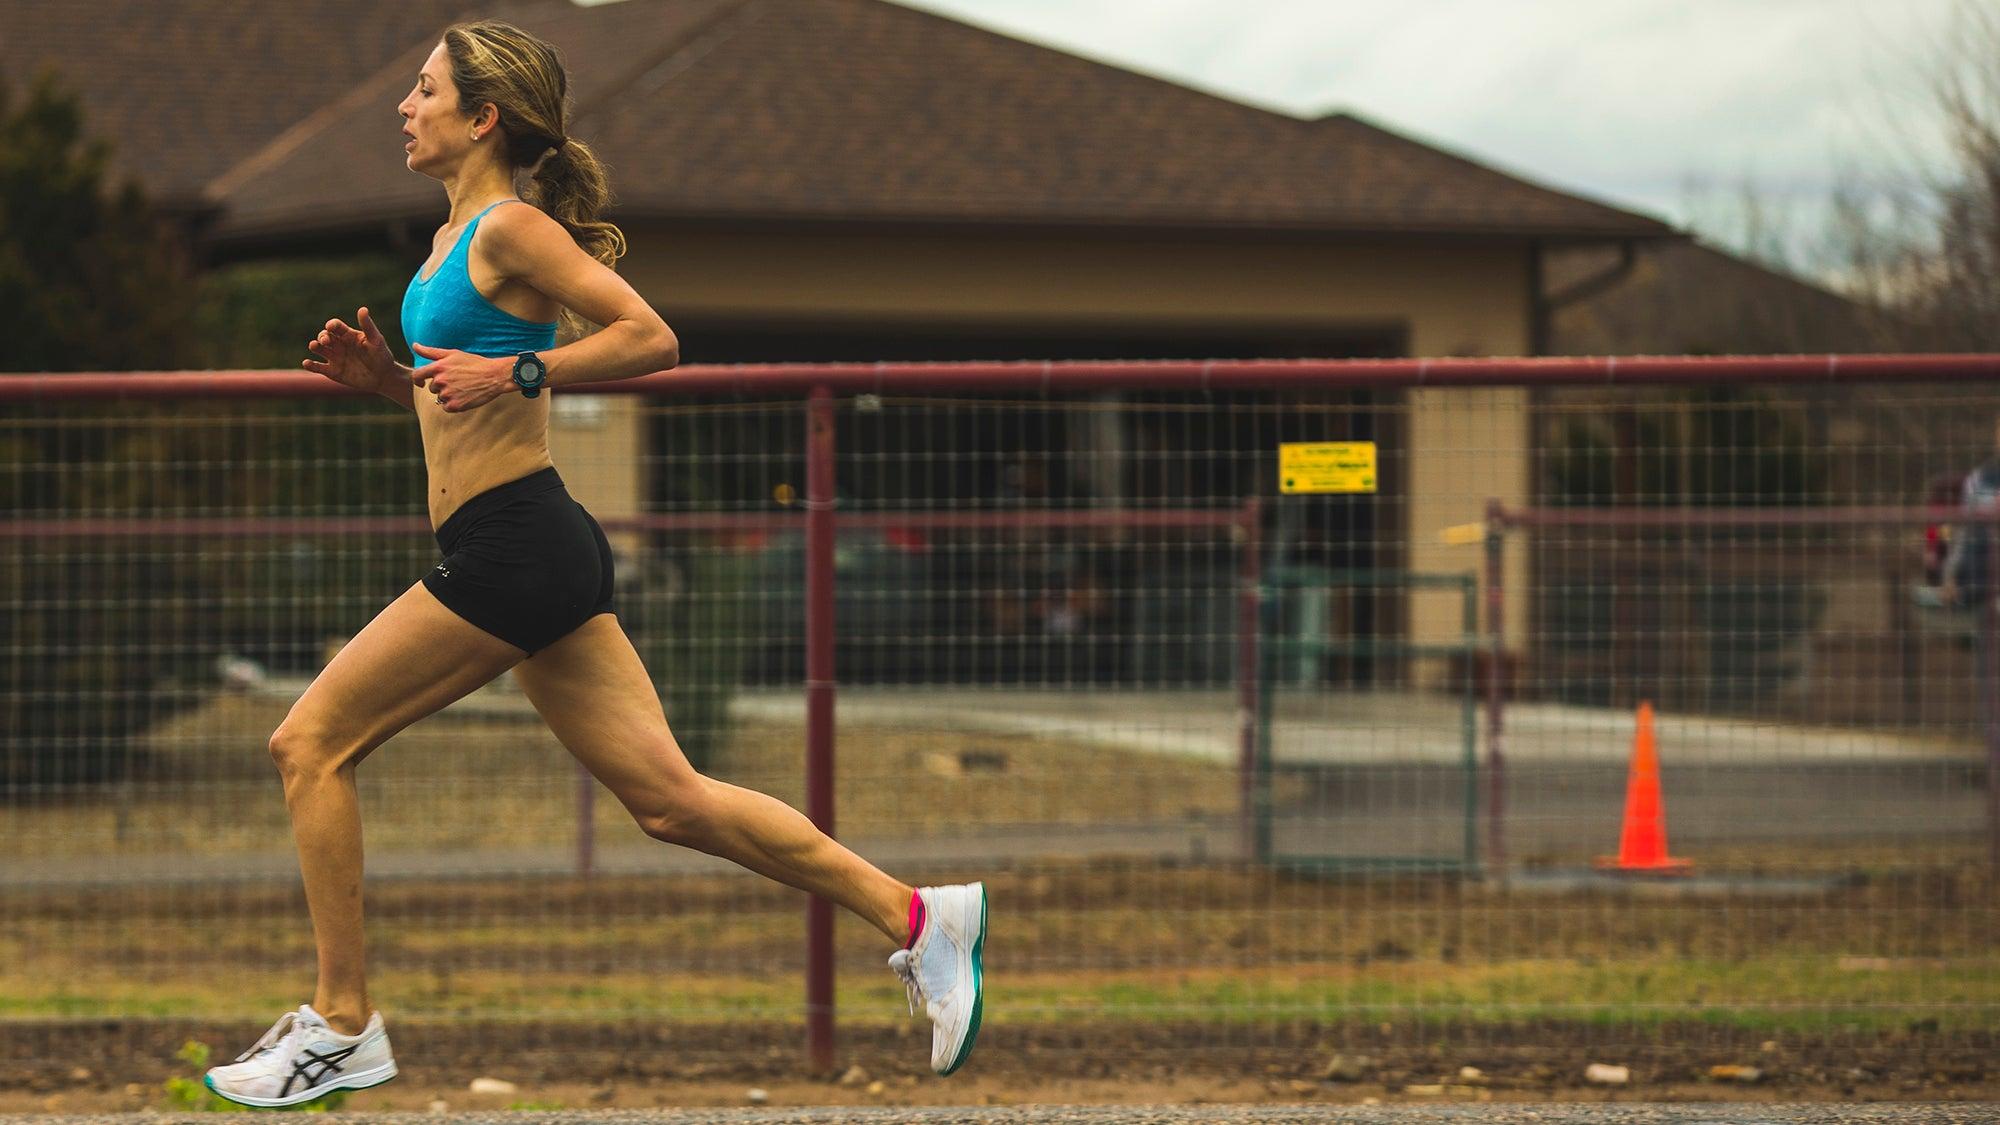 Proper Running Form - How to Run